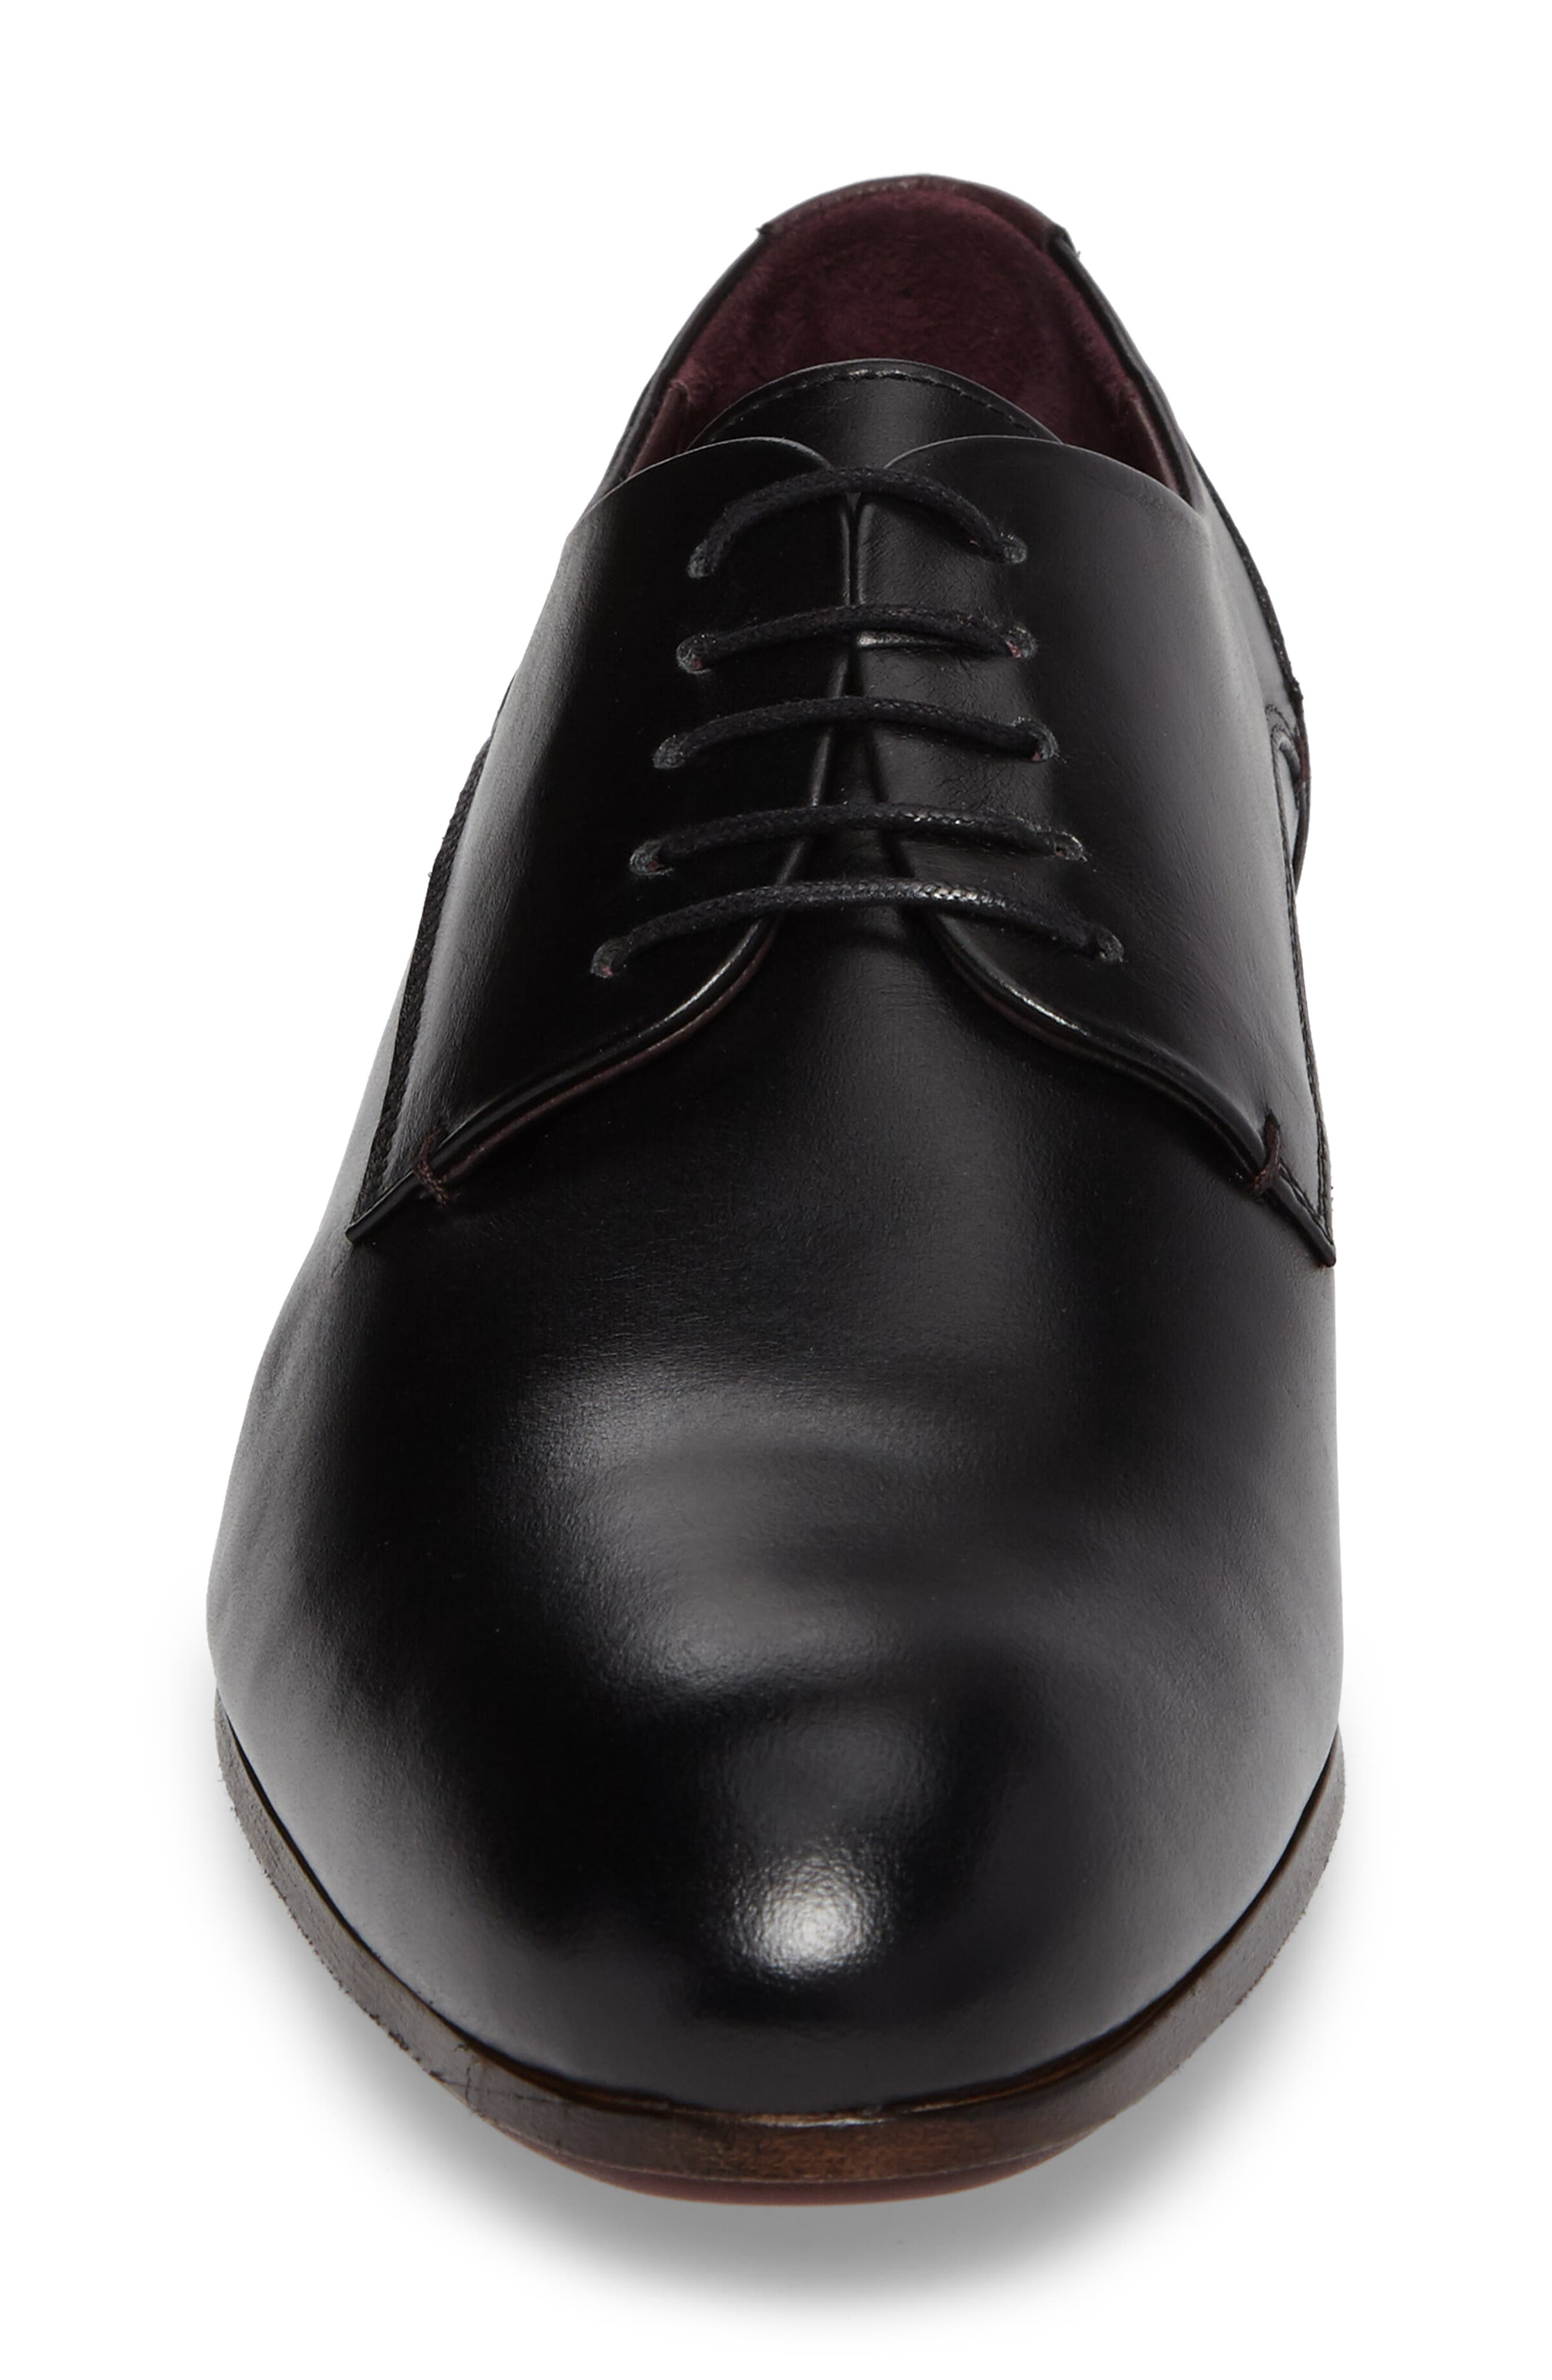 Avionn Plain Toe Derby,                             Alternate thumbnail 4, color,                             Black Leather